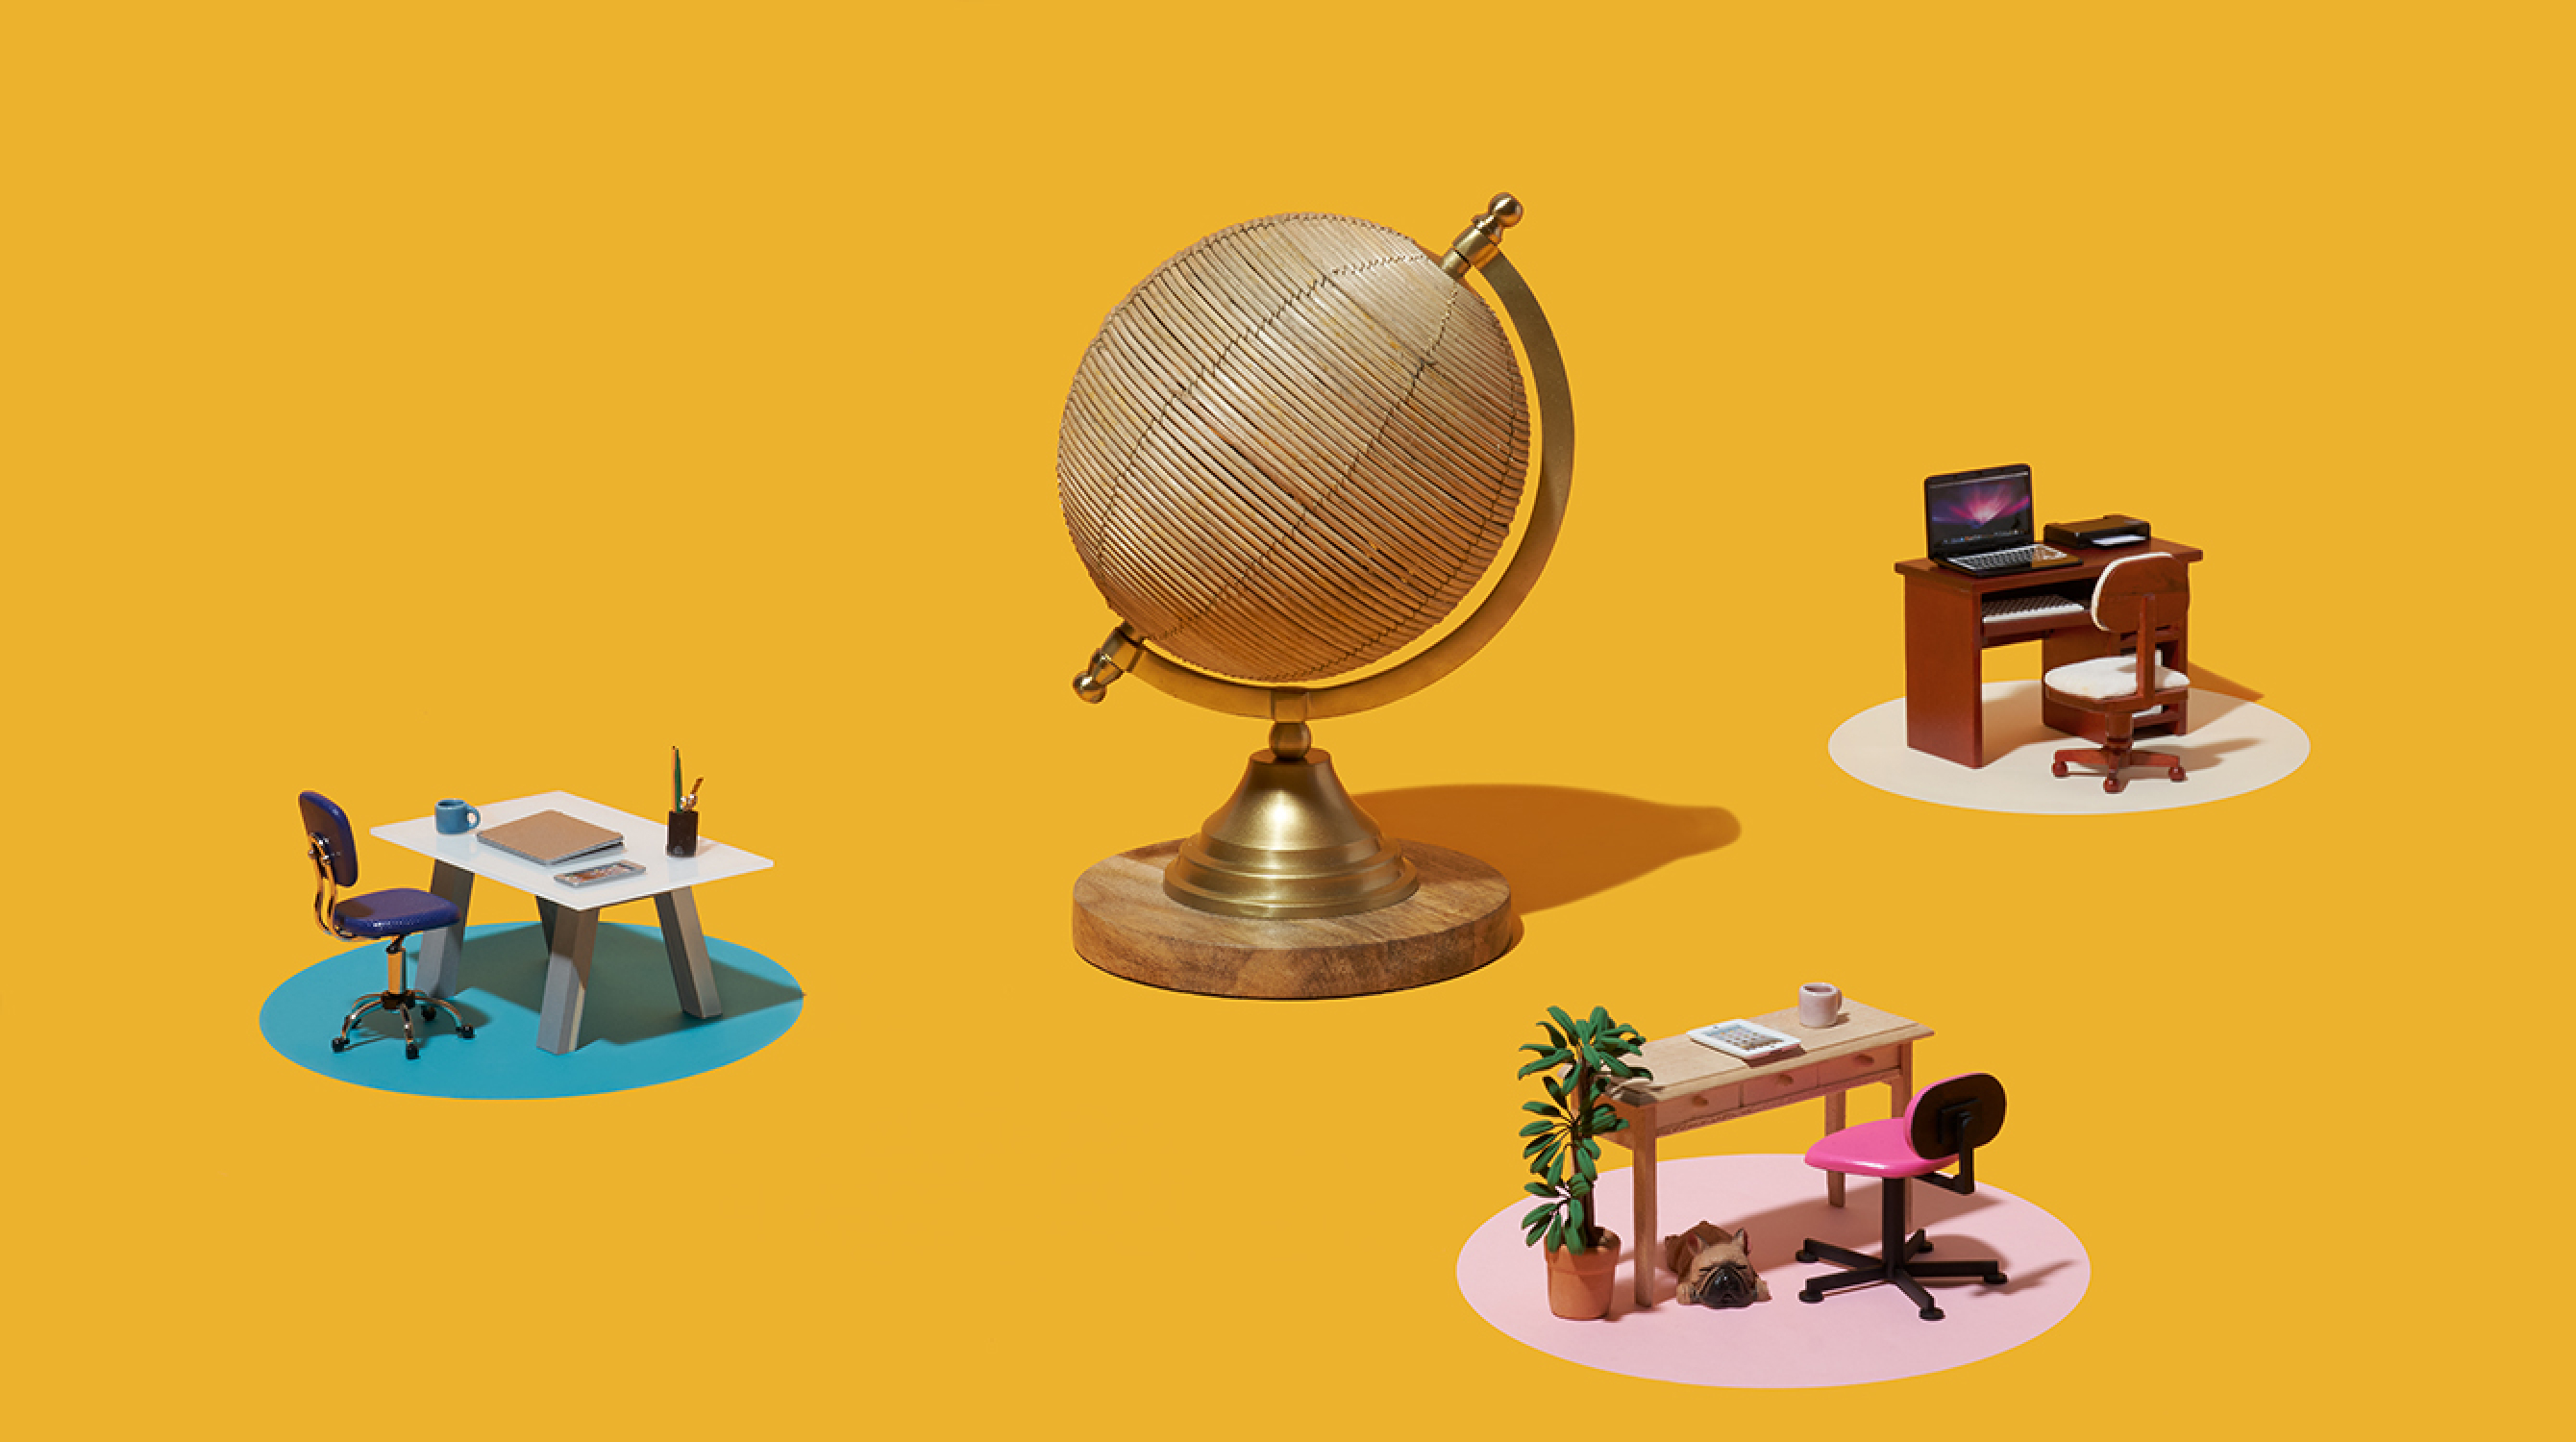 Three desks surrounding a globe representing remote work